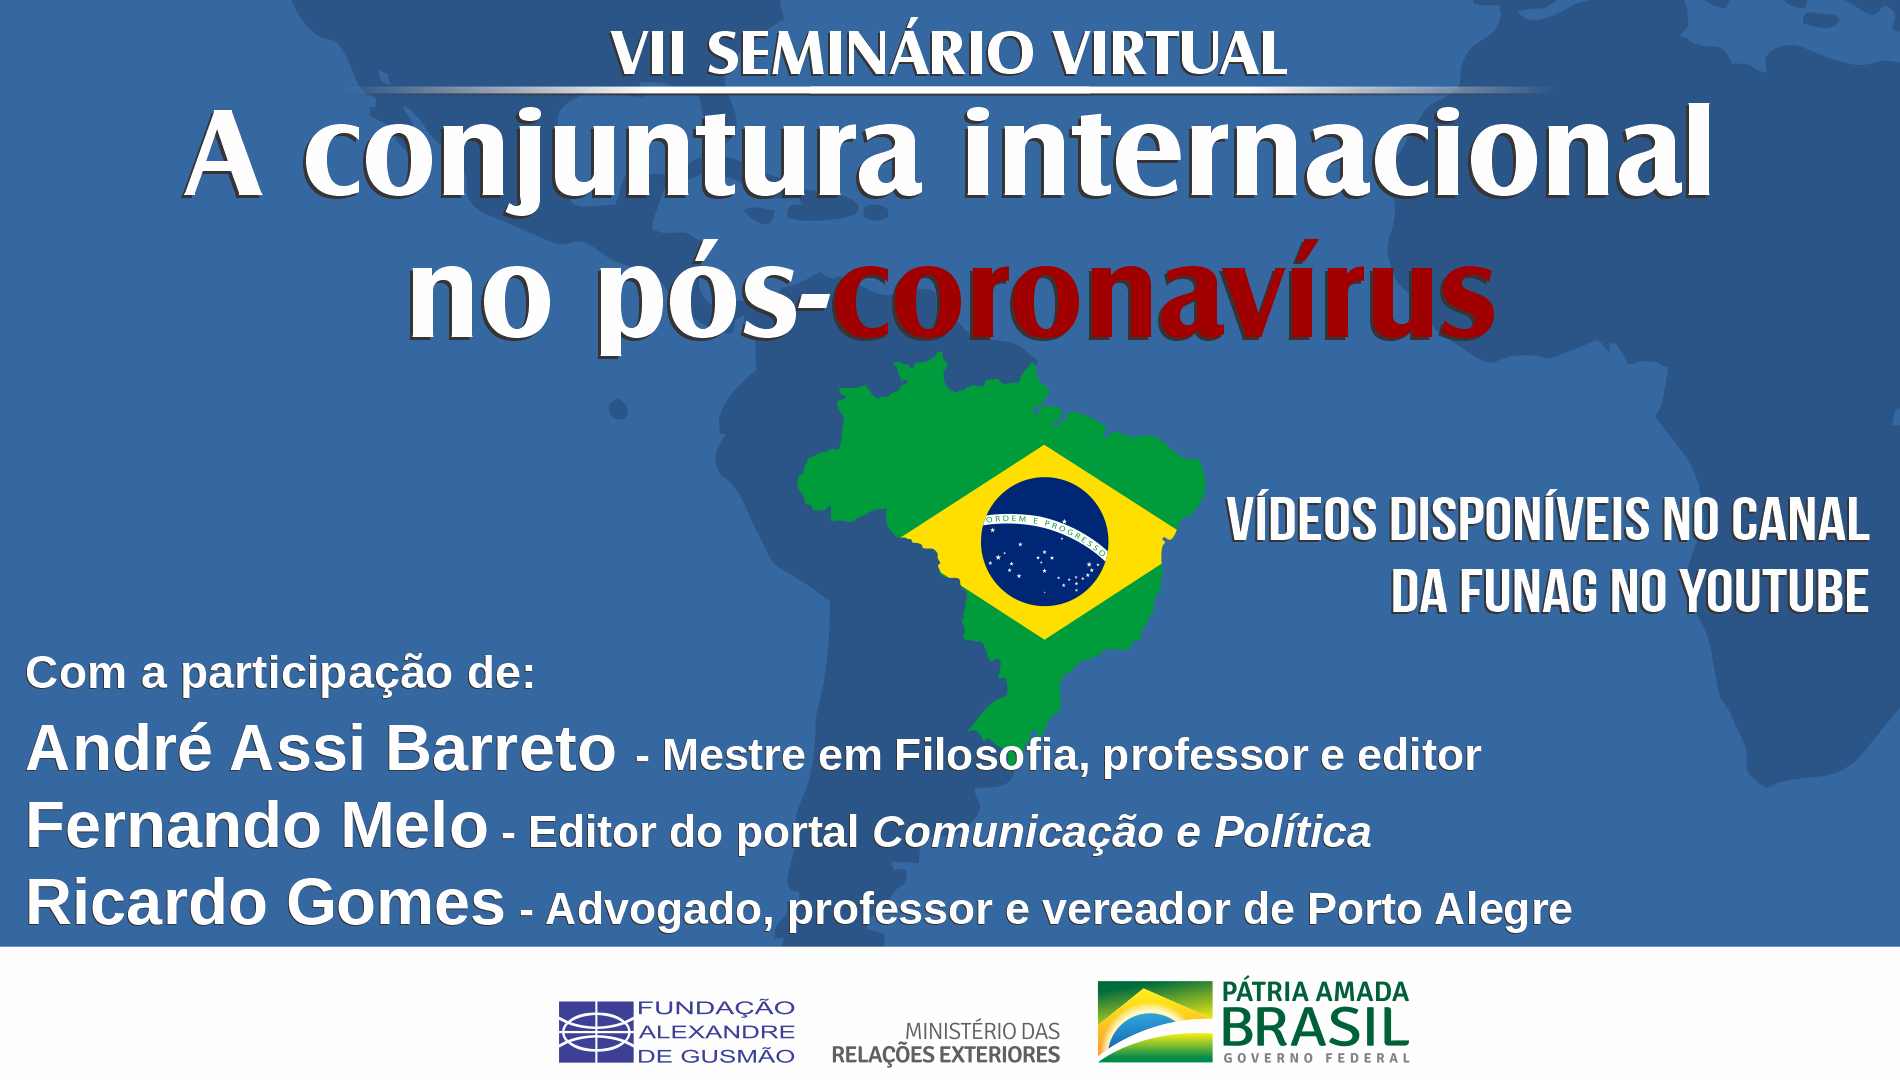 Assista aos vídeos do VII seminário virtual sobre a conjuntura internacional no pós-coronavírus